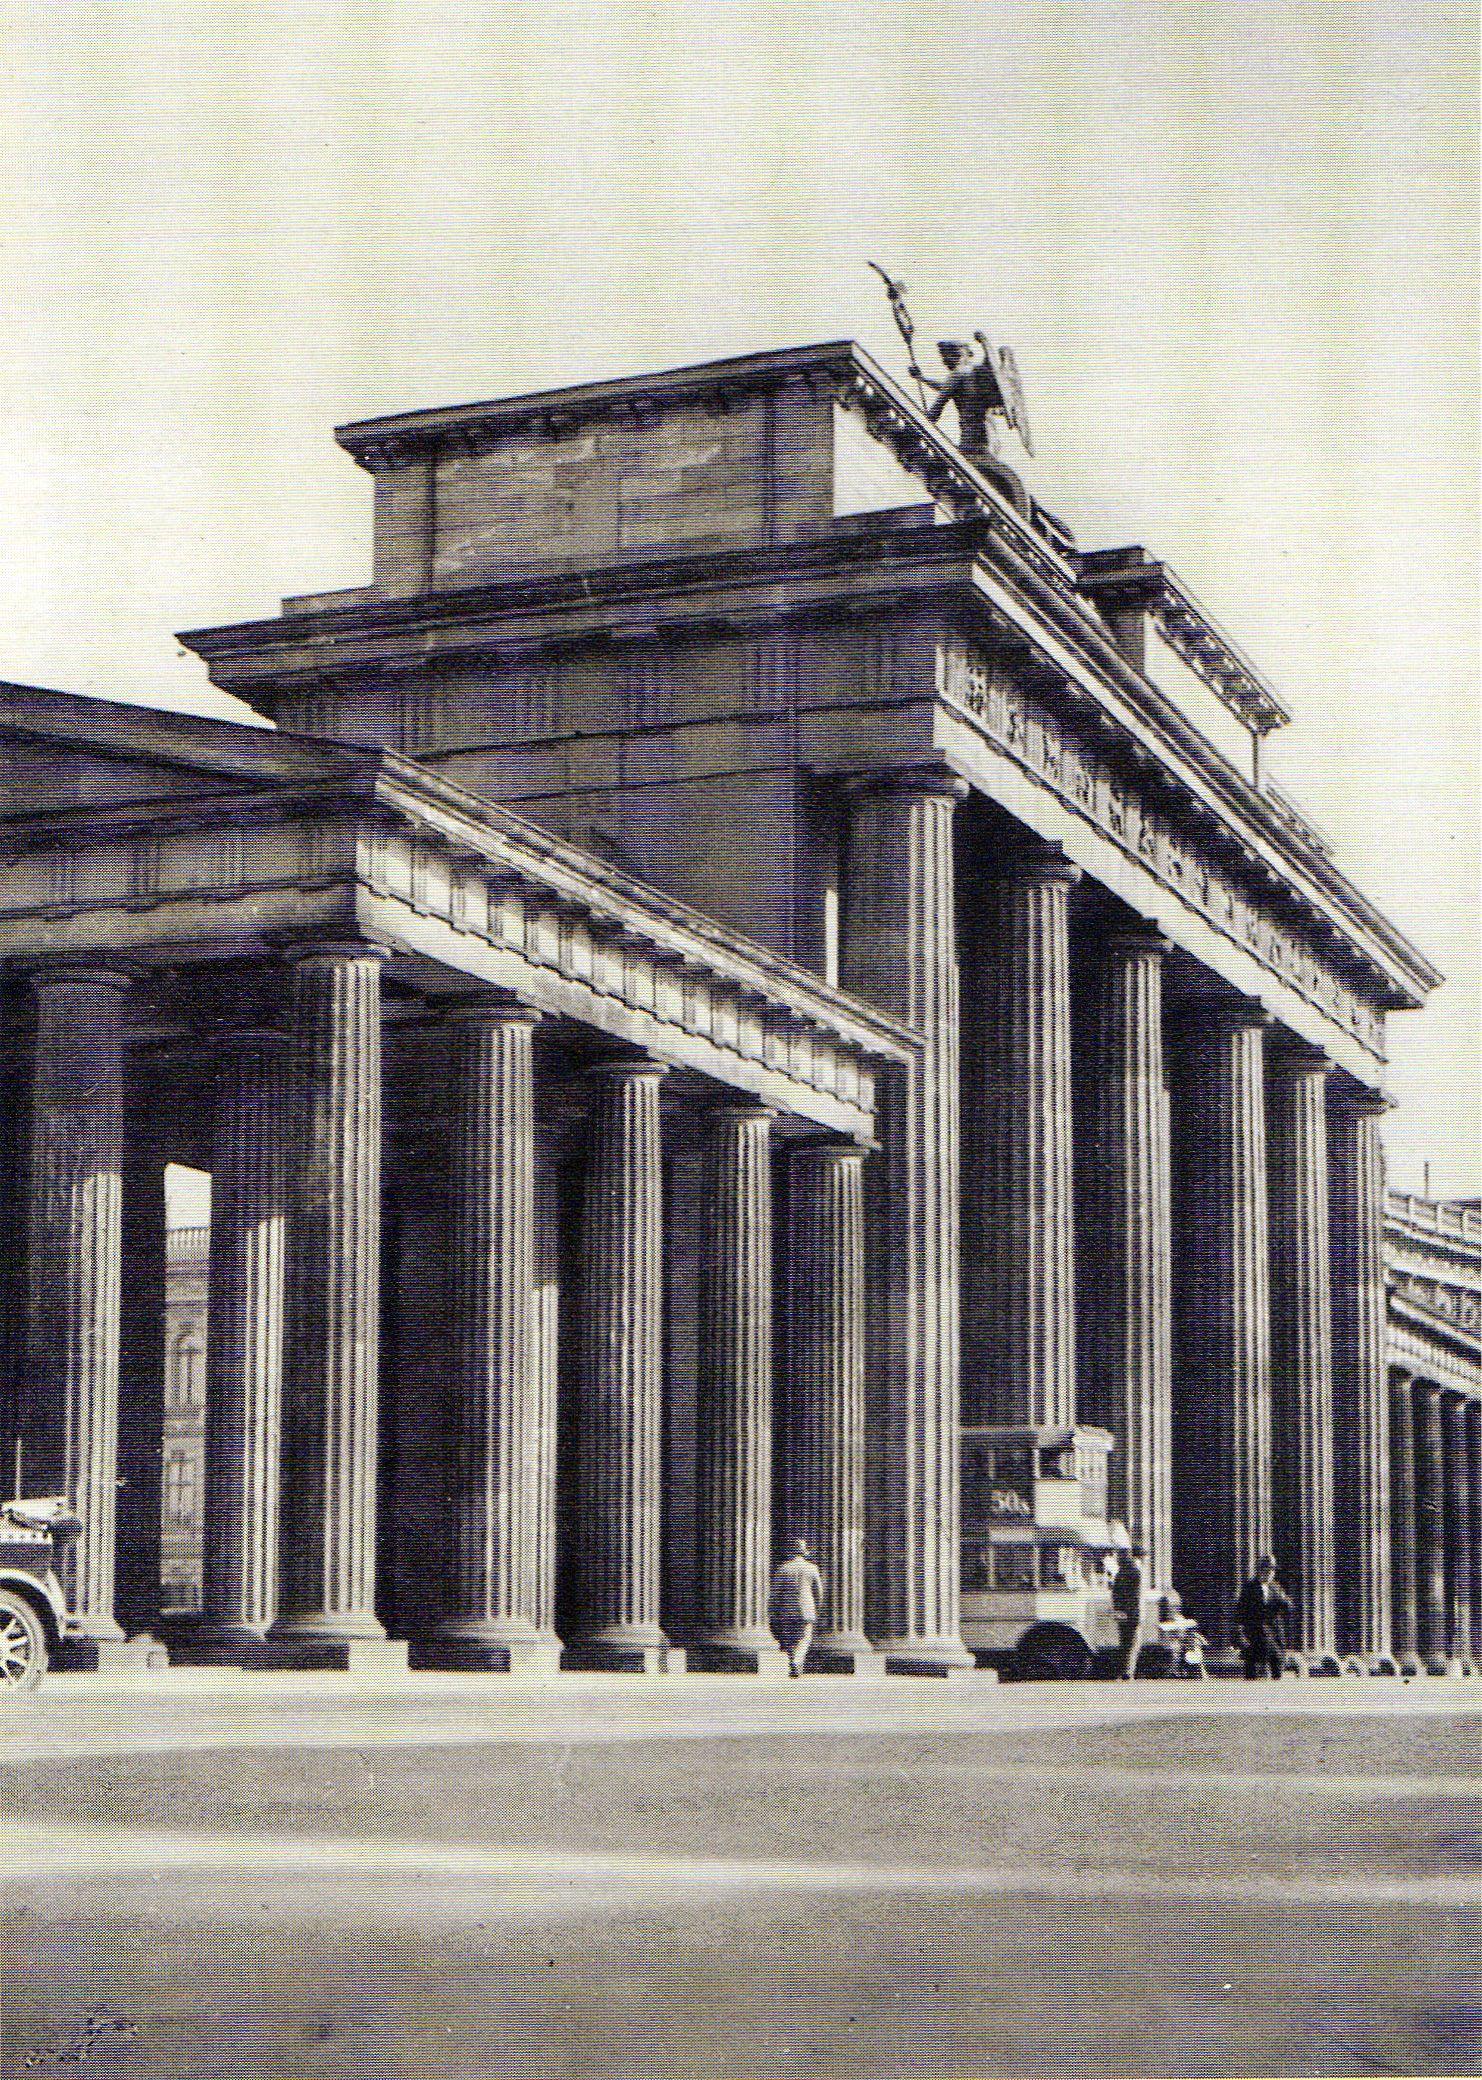 Sasha Stone Berlin Brandenburger Tor Um 1929 Brandenburger Tor Neue Wache Berlin